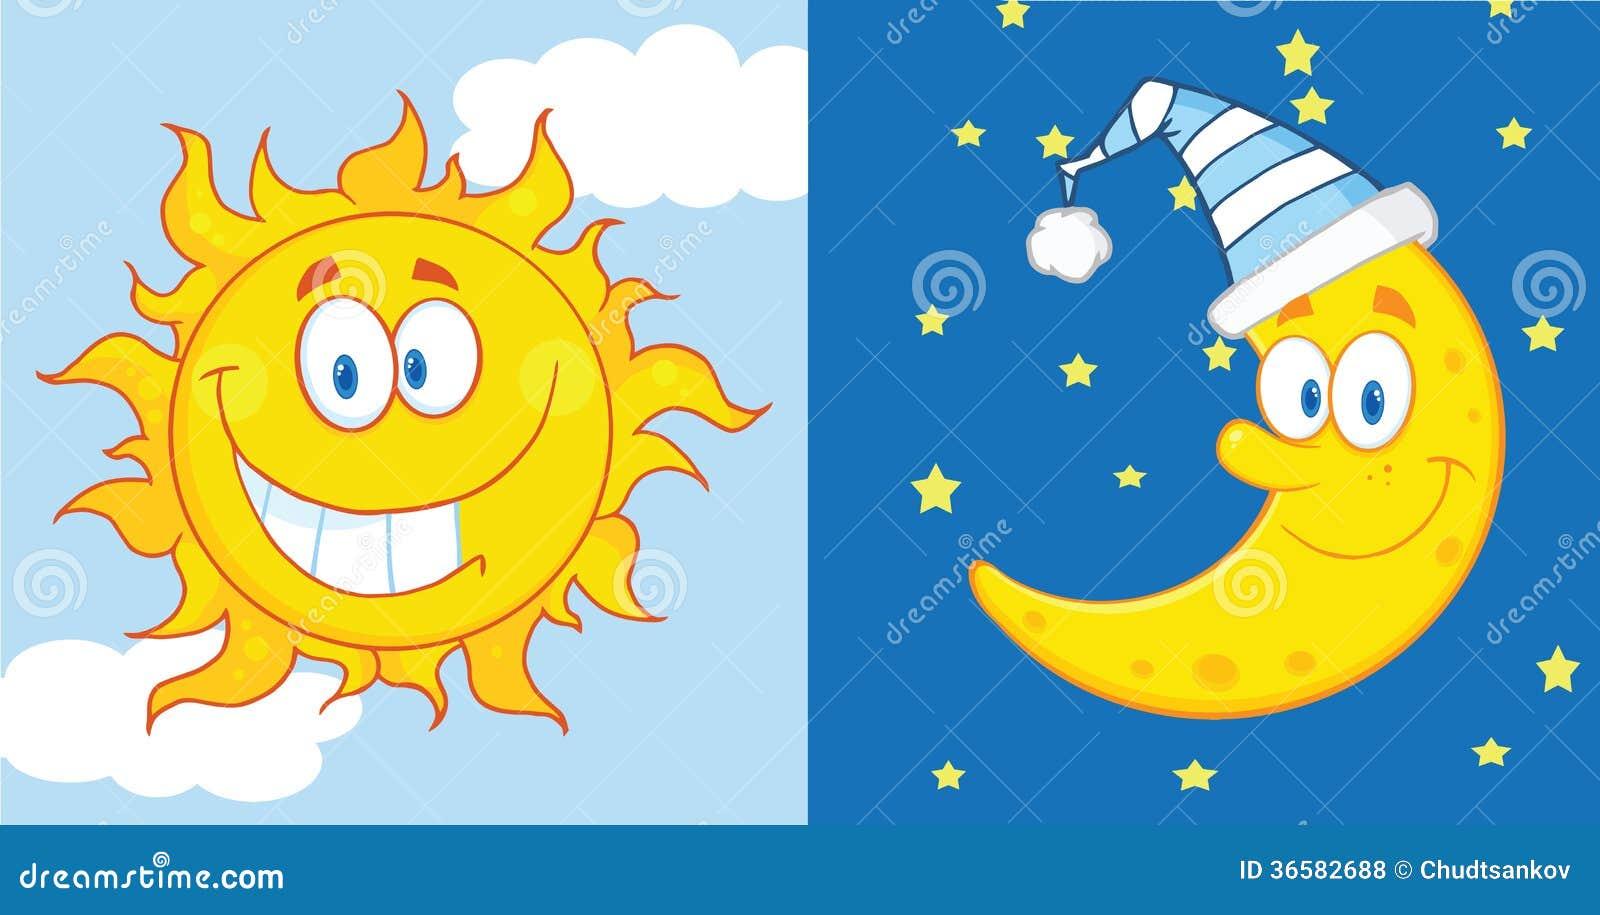 Sun And Moon Cartoon Characters Royalty Free Stock Photos - Image ...